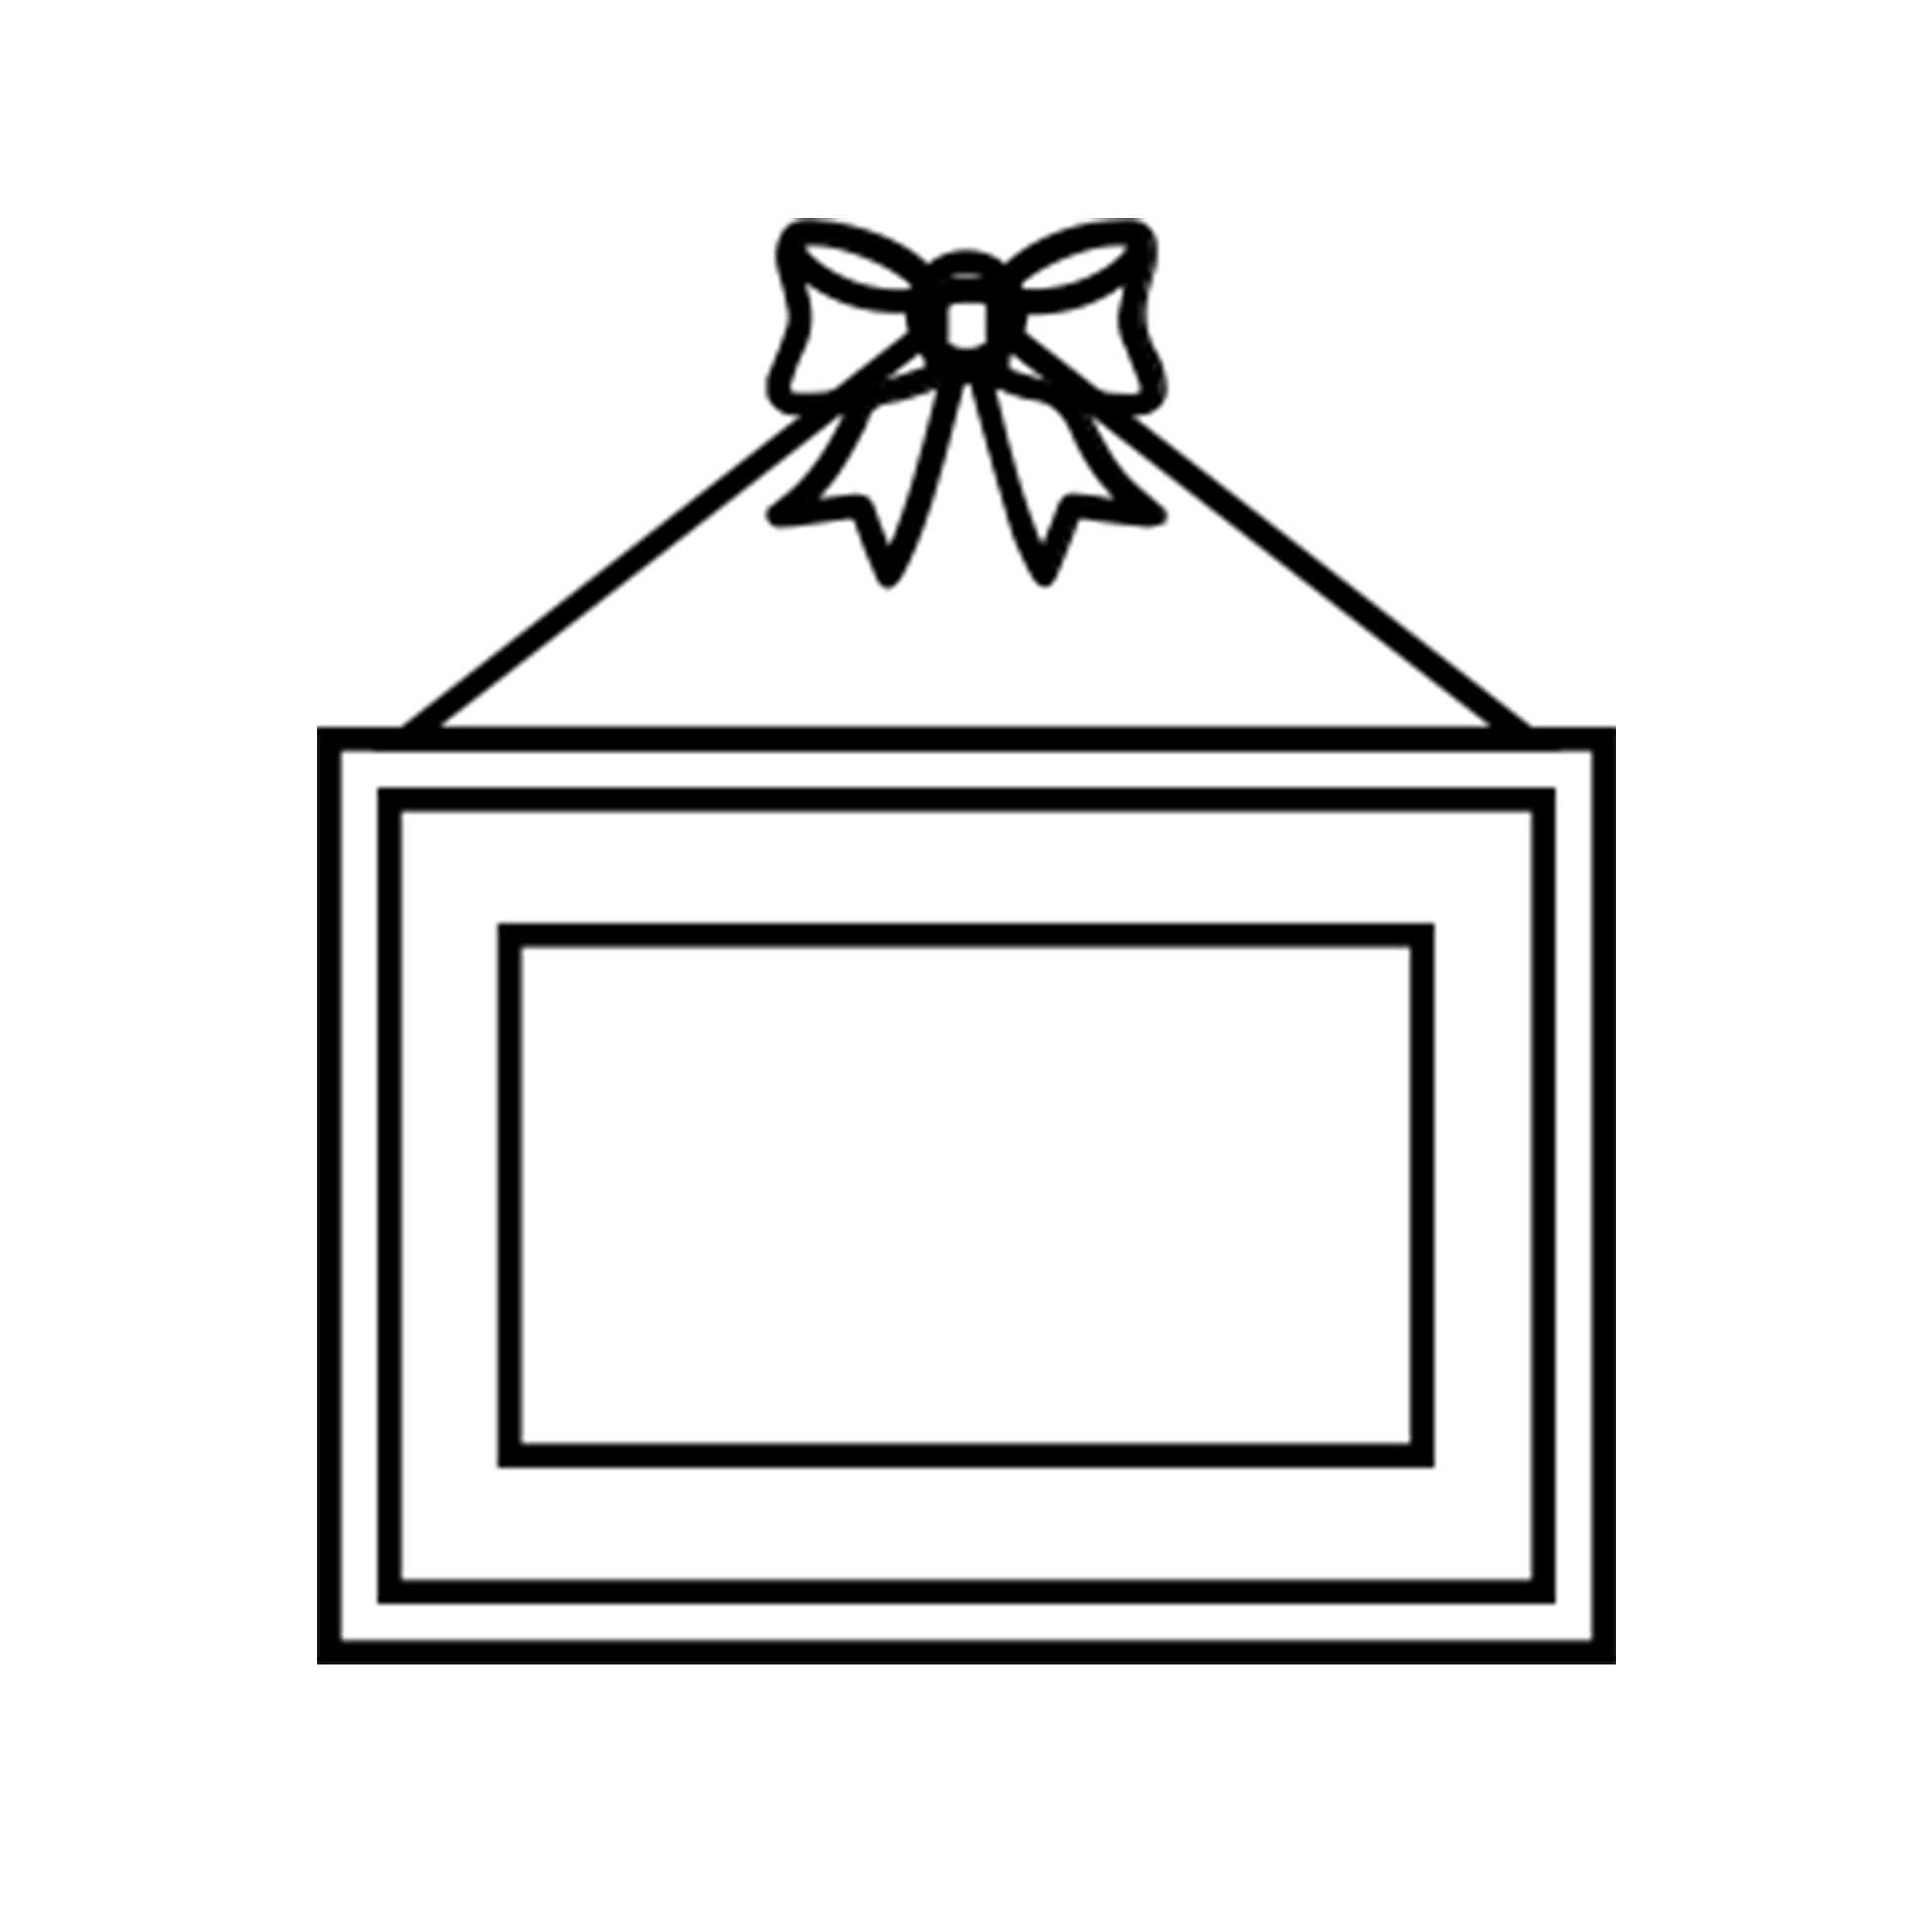 Final Frame